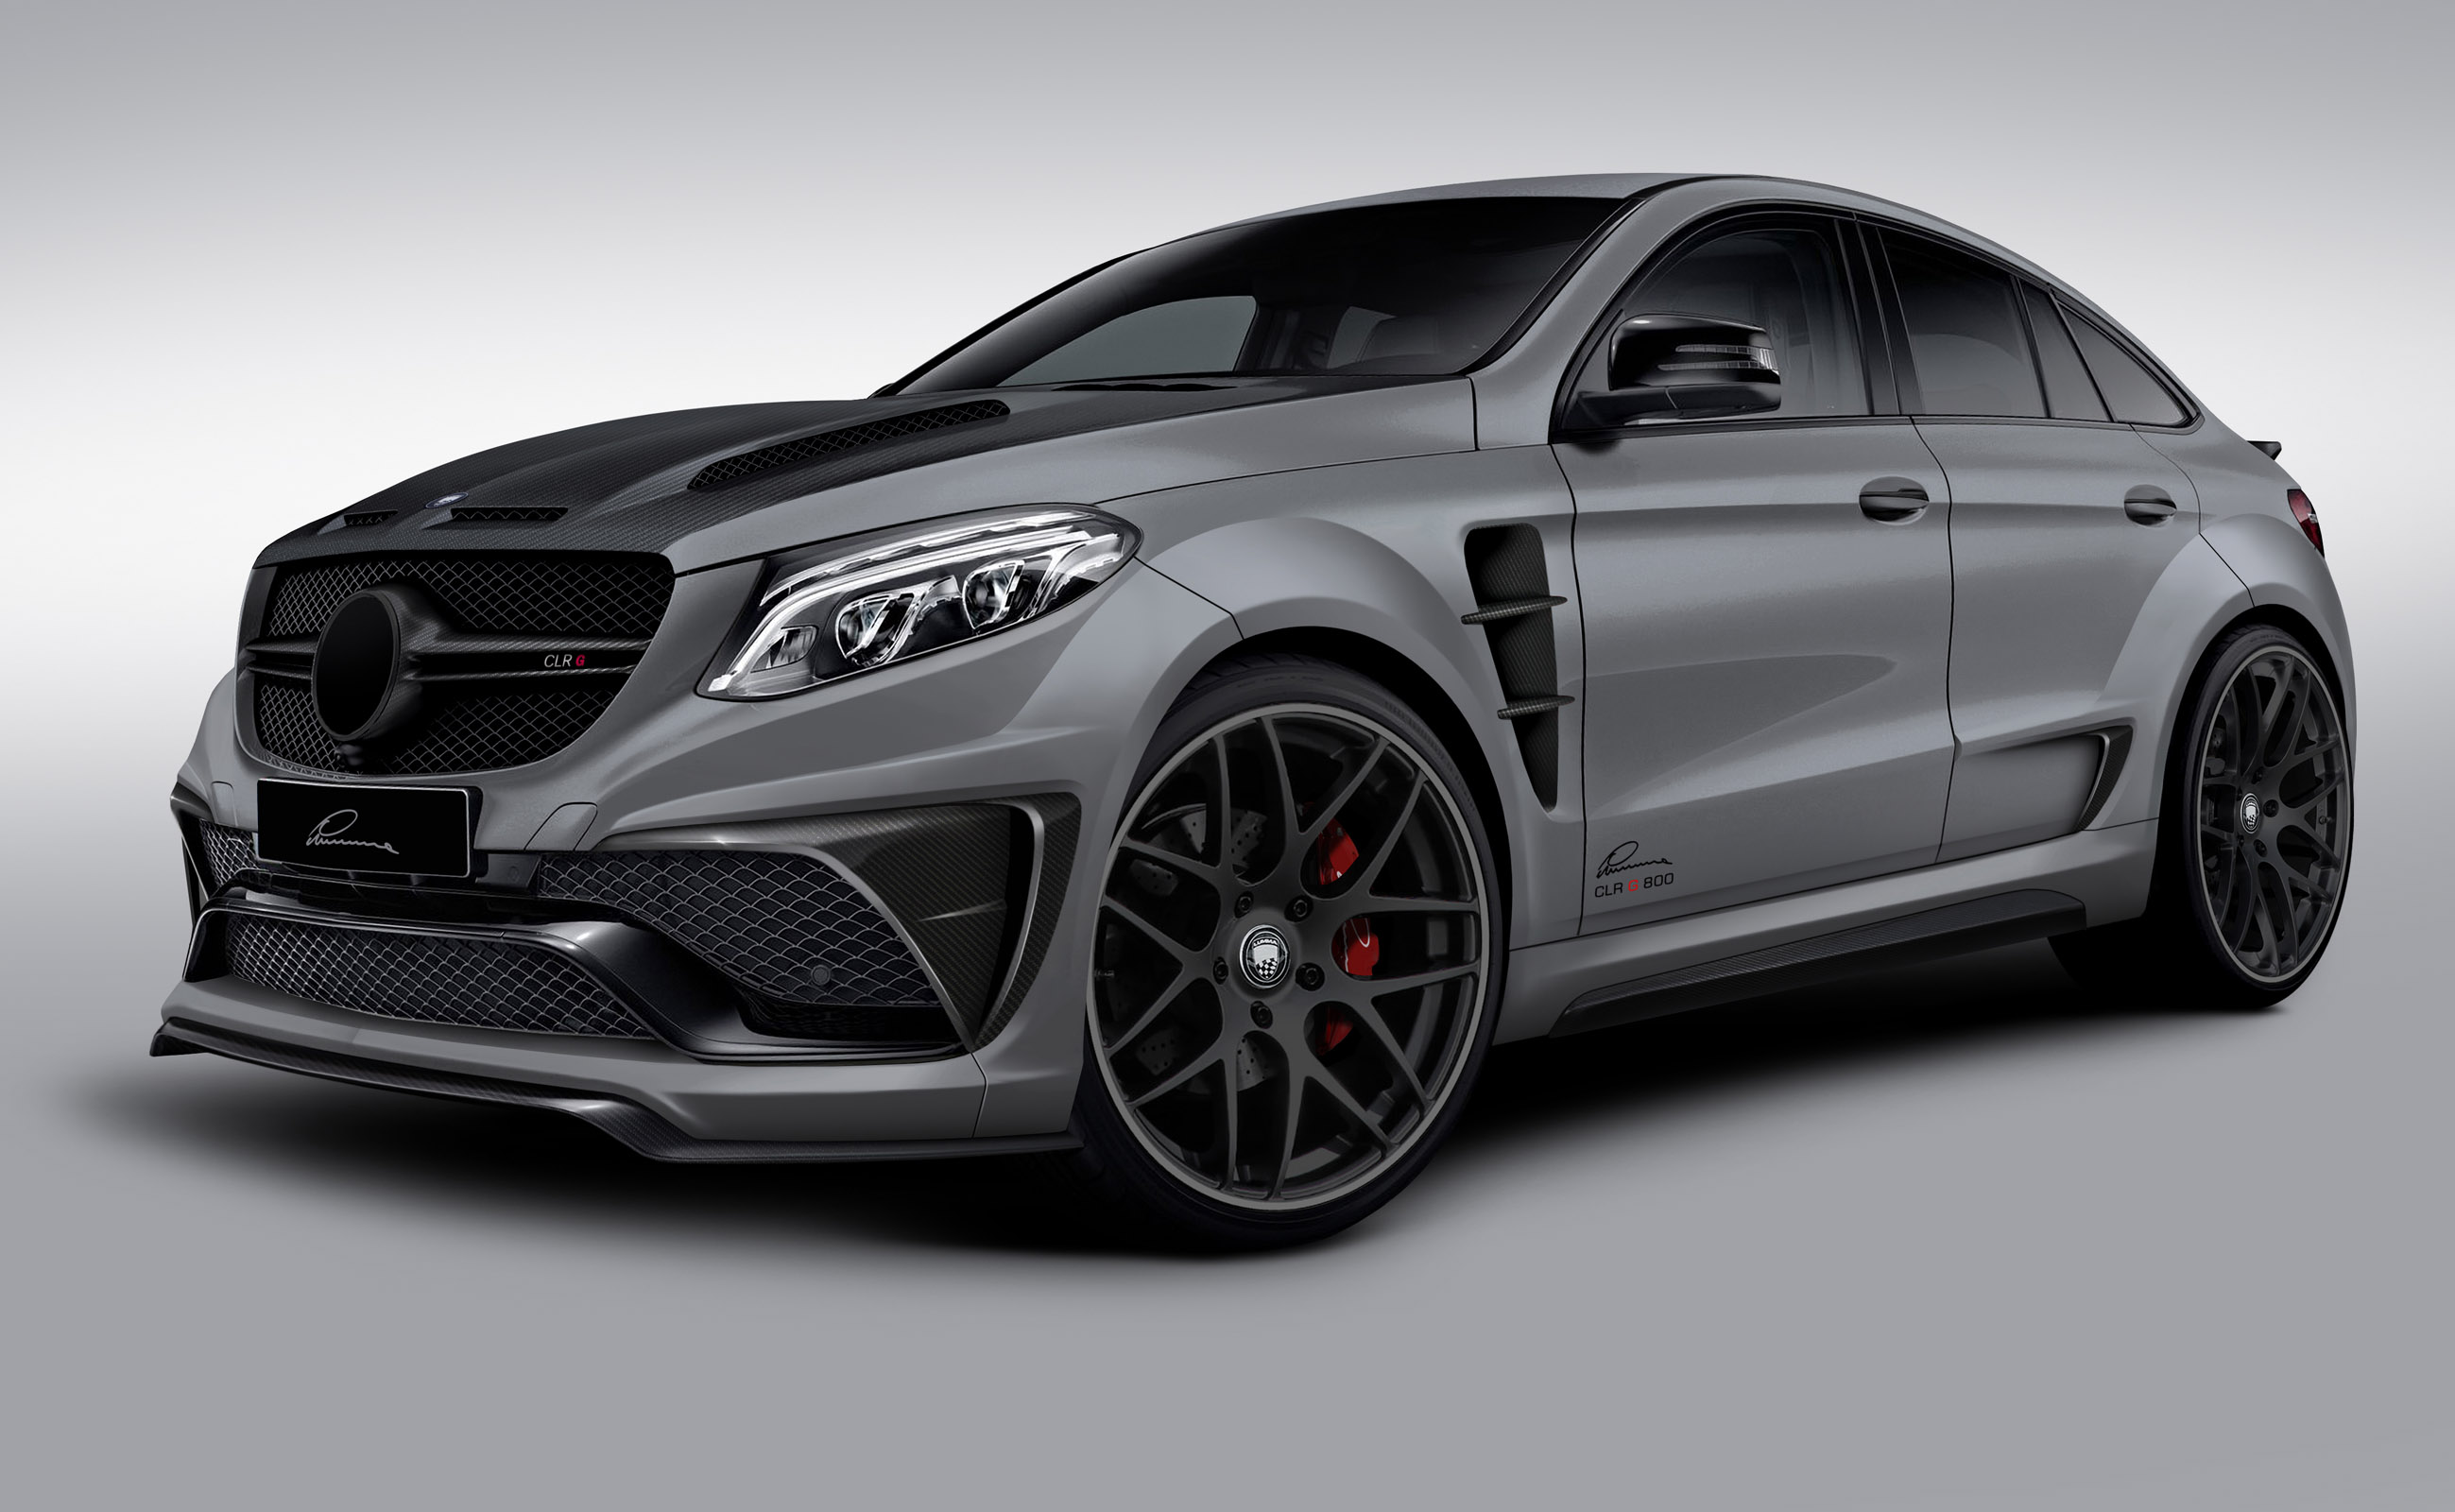 2015 LUMMA Mercedes-Benz GLE Coupe CLR G800